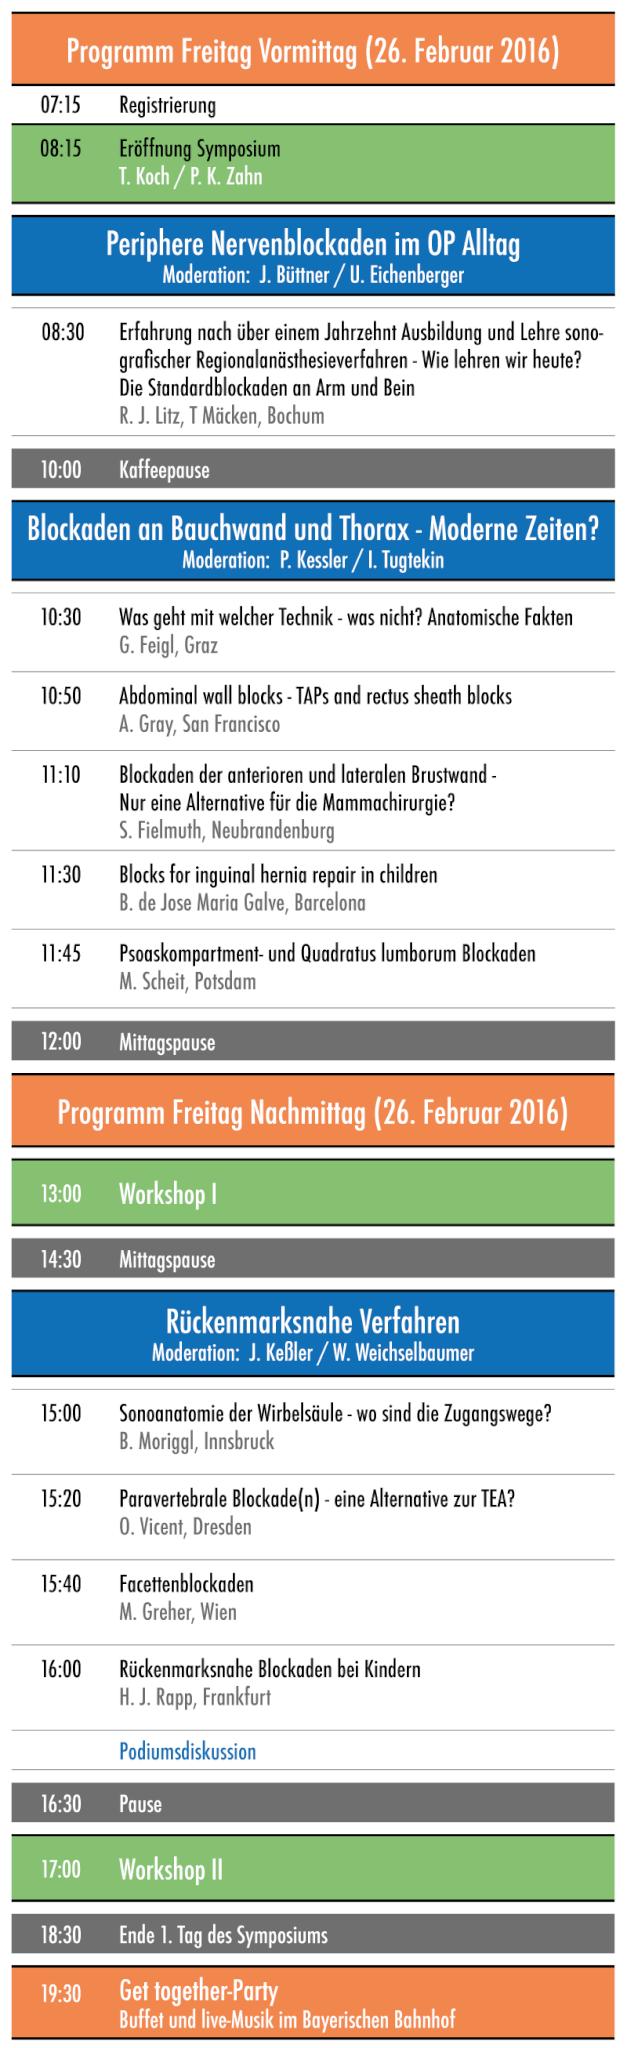 Programm Freitag 26. Februar 2016 USRA Symposium